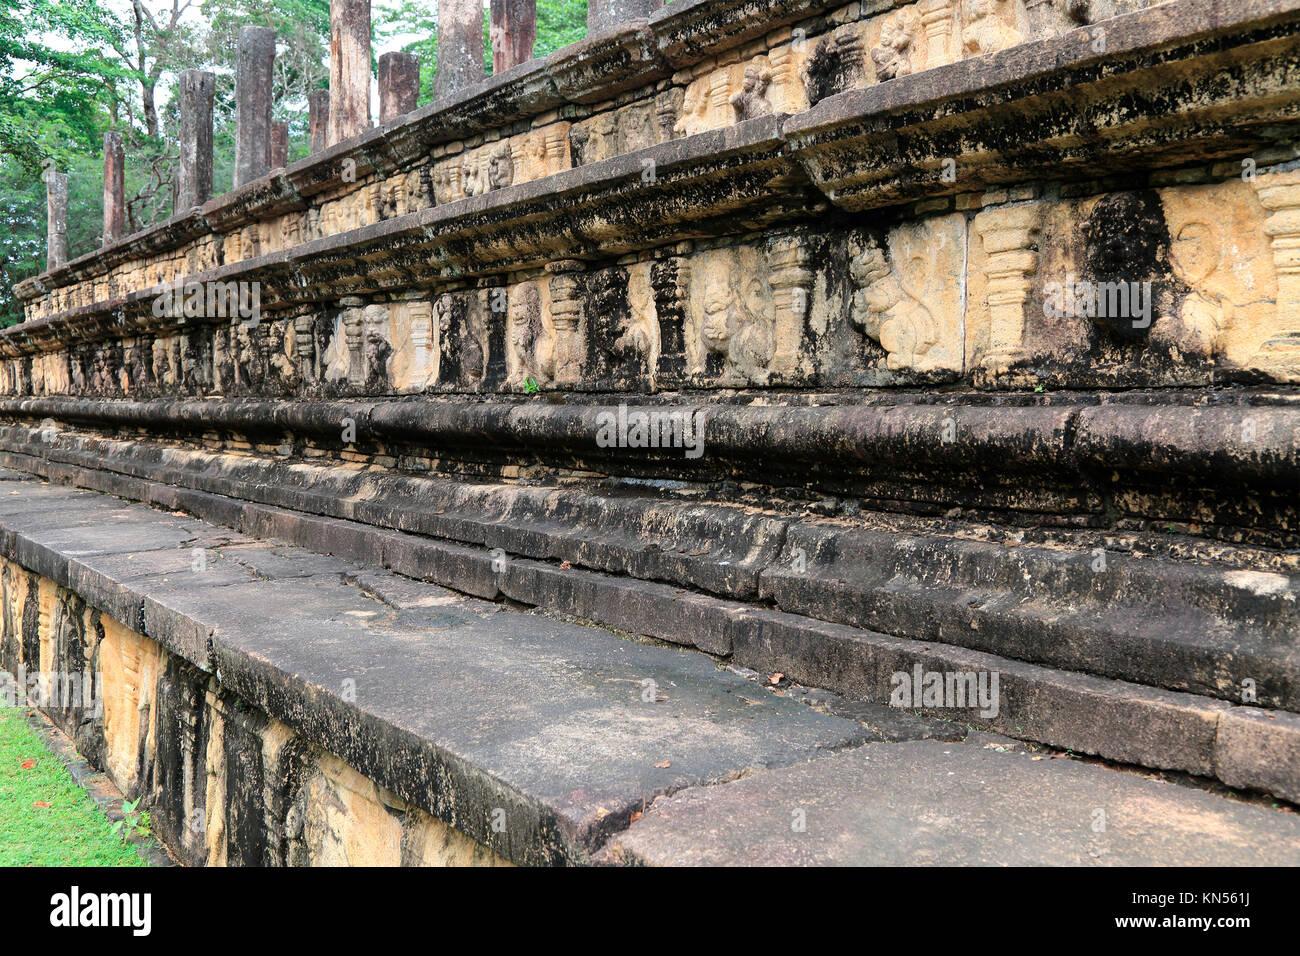 Council Chamber, Citadel, UNESCO World Heritage Site, the ancient city of Polonnaruwa, Sri Lanka, Asia - Stock Image